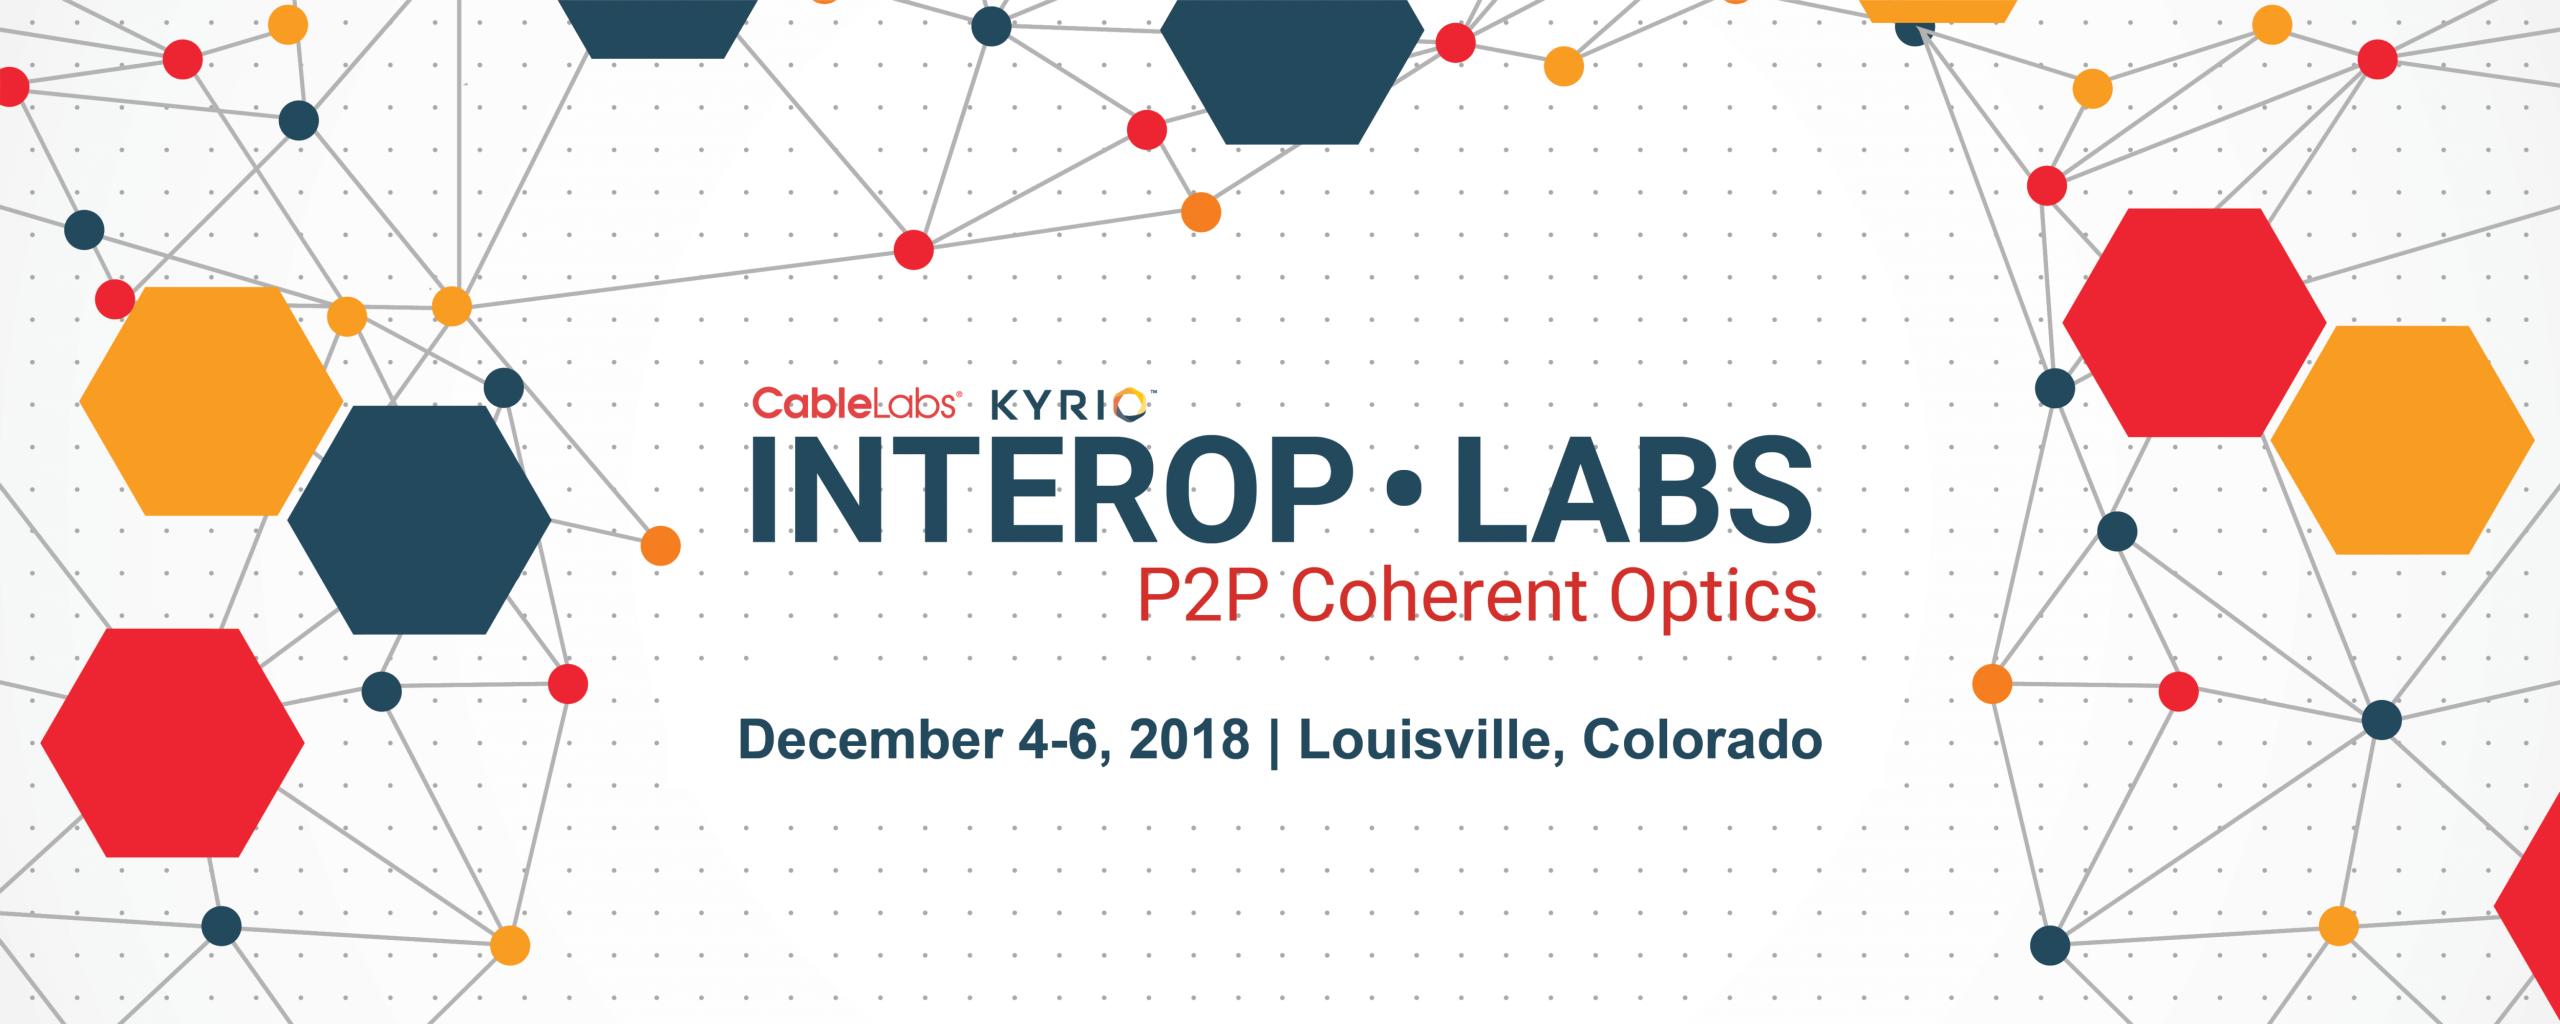 Interop·Labs: P2P Coherent Optics December 2018